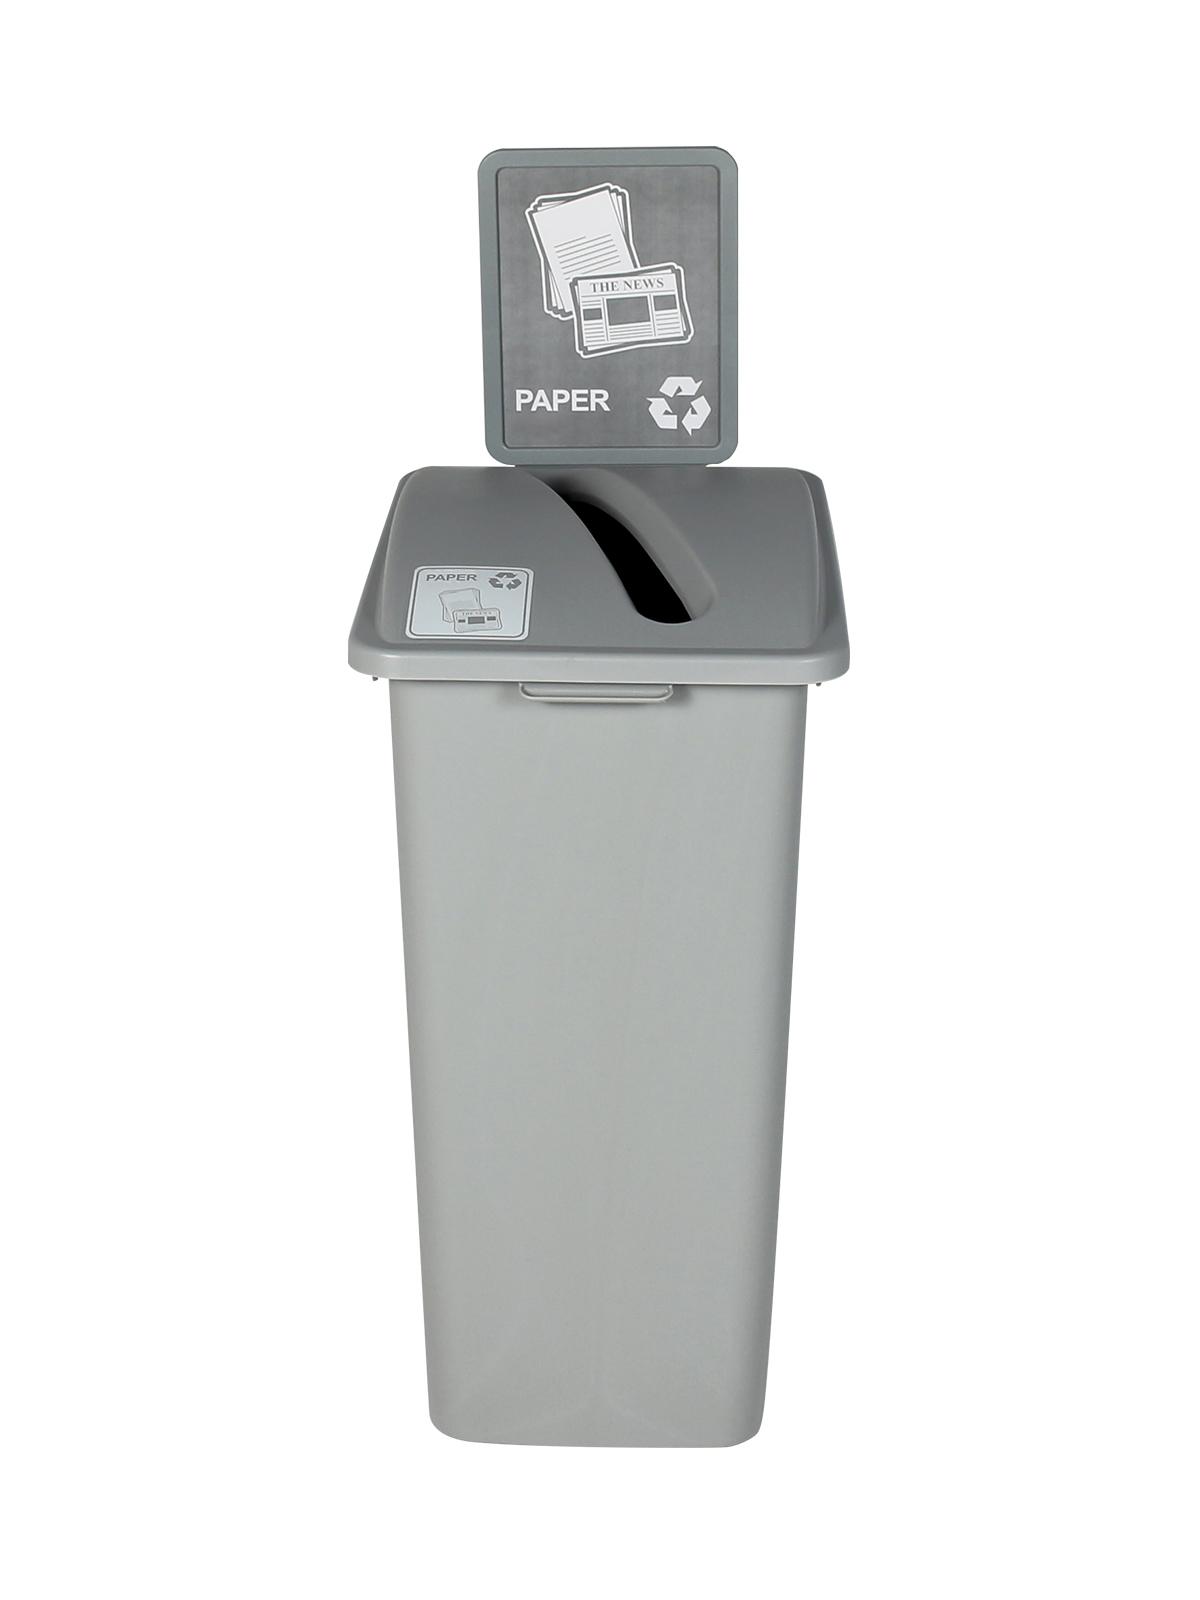 WASTE WATCHER XL - Single - Paper - Slot - Grey